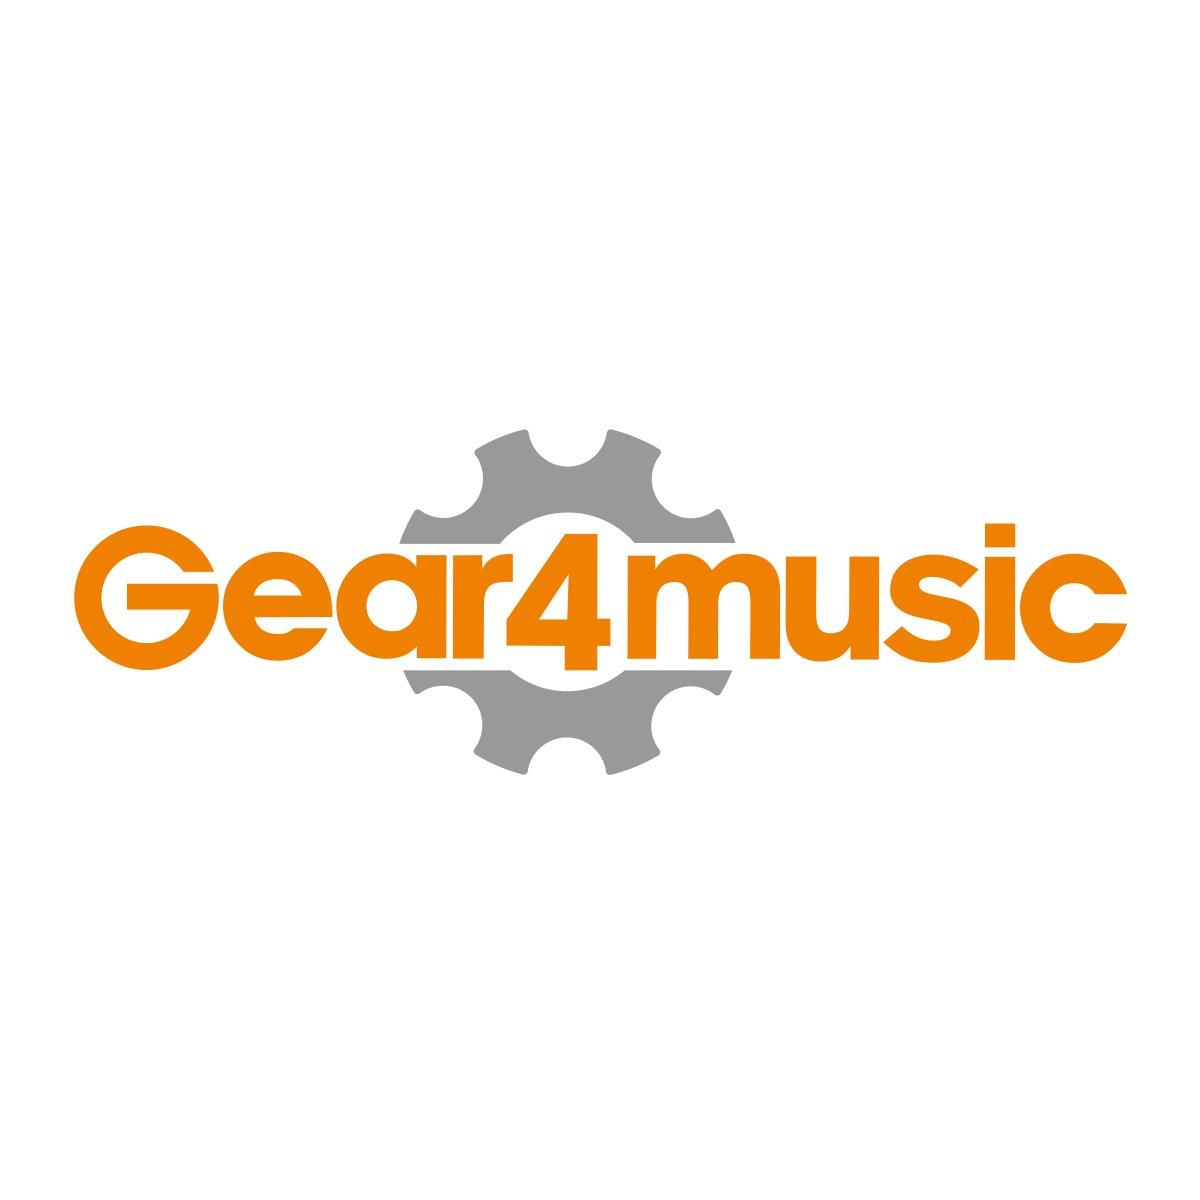 Alto Saxophone by Gear4music, Black & Gold